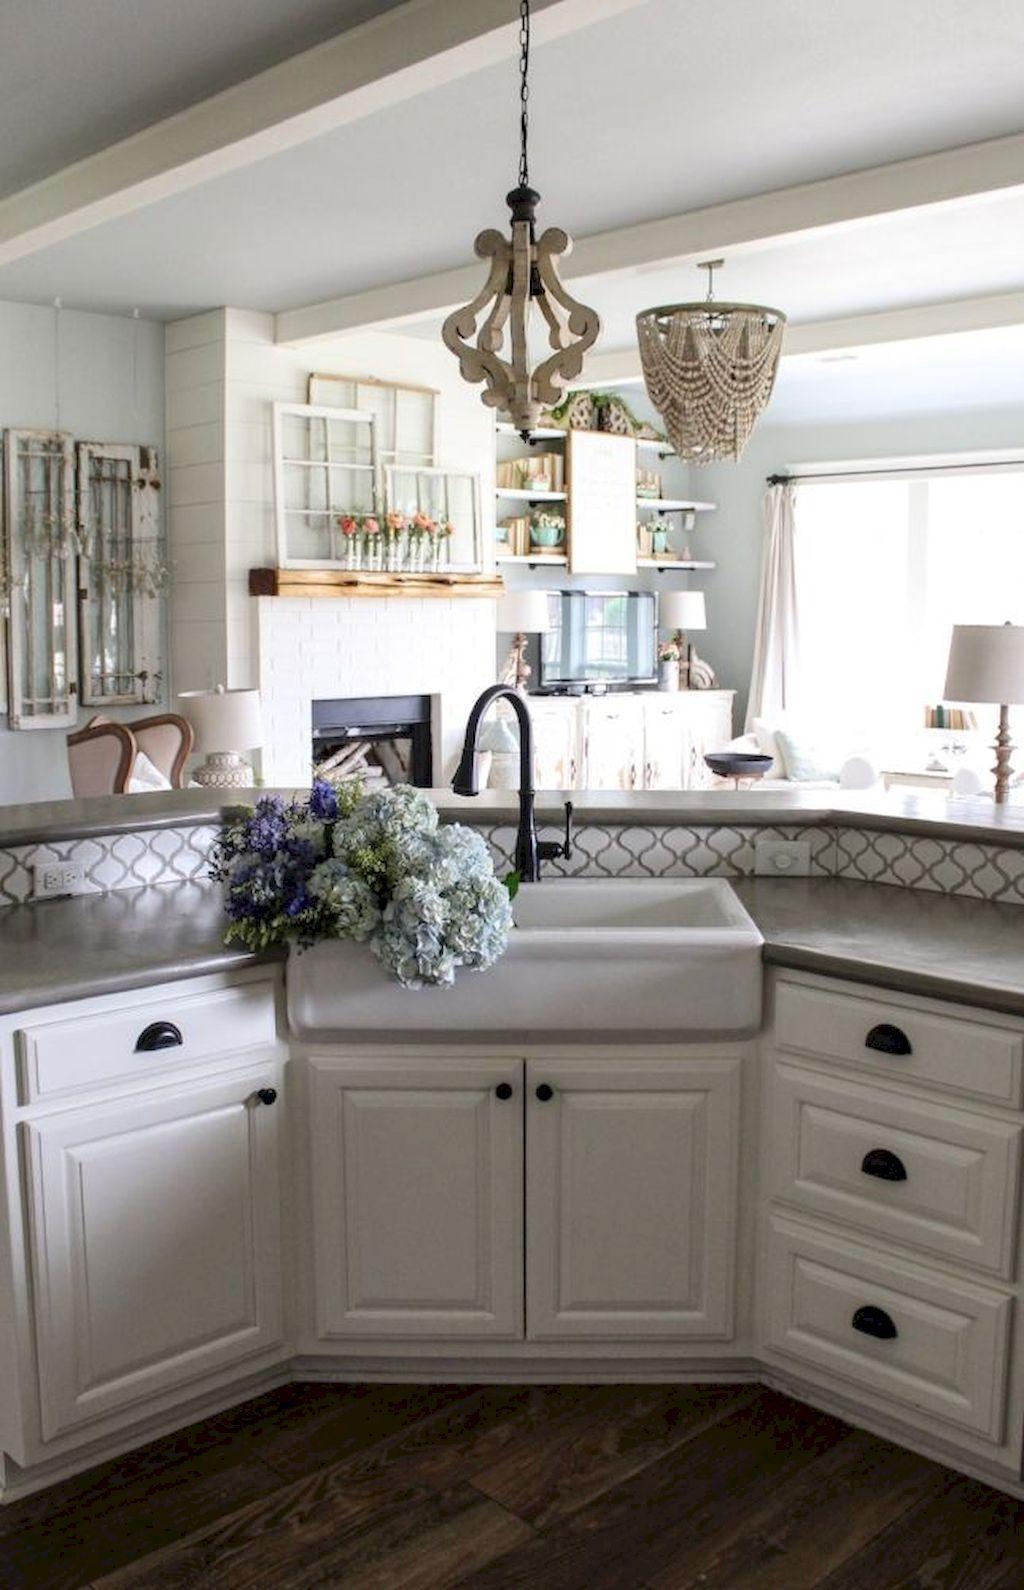 Nice 70 Rustic Kitchen Sink Farmhouse Style Ideas https